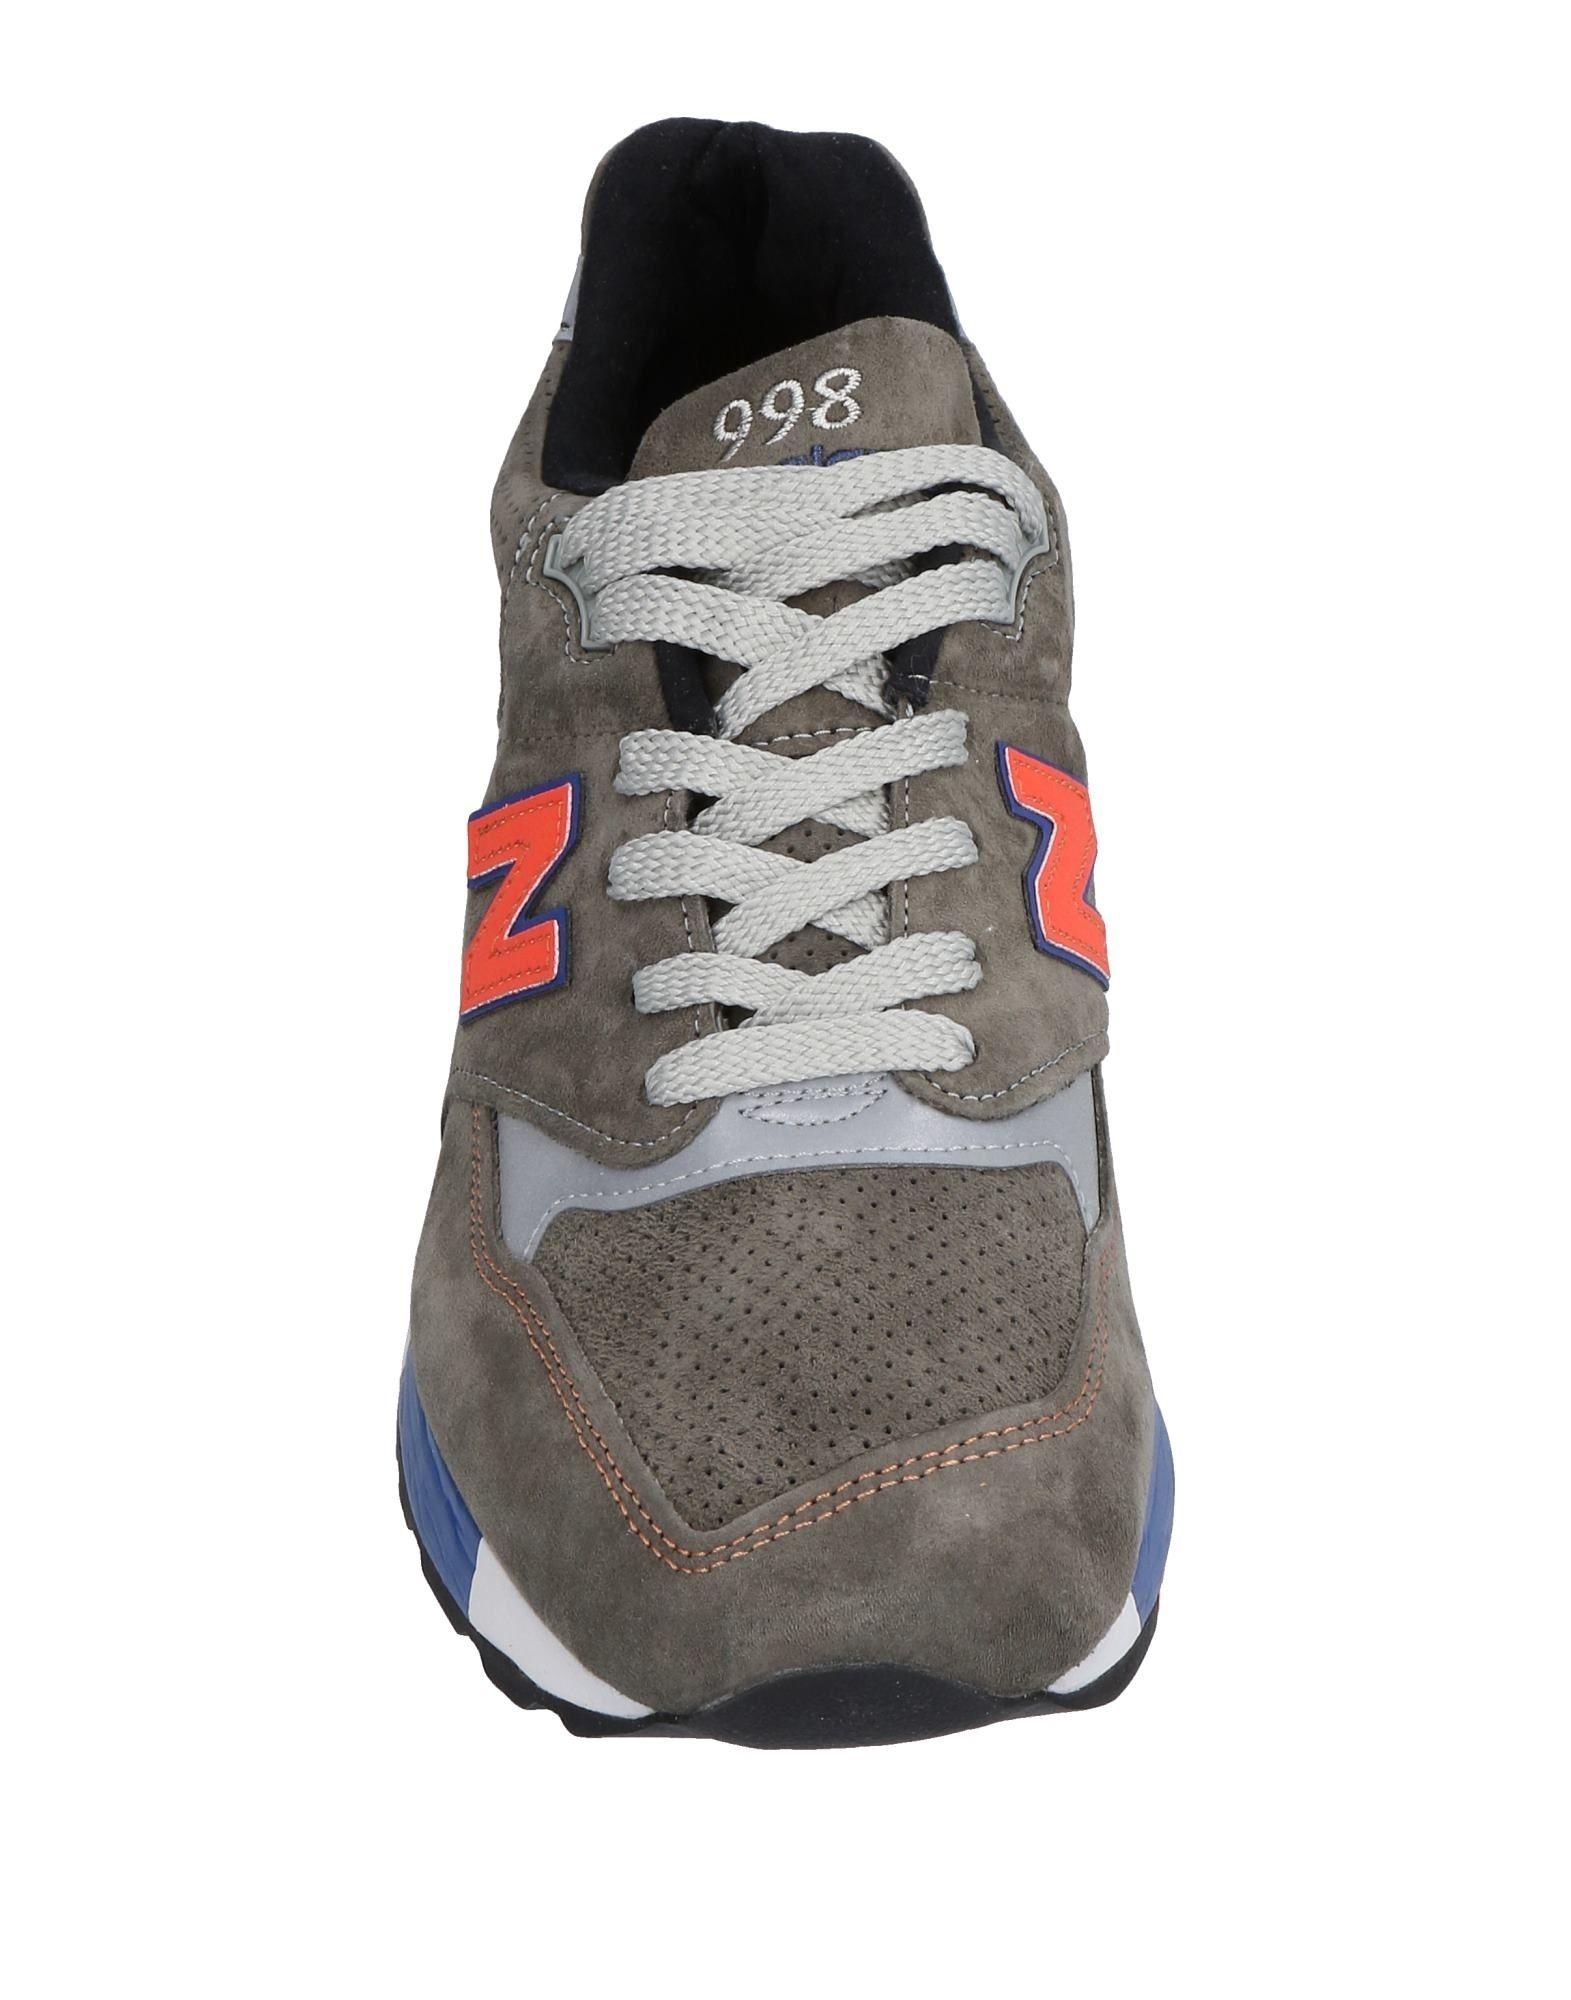 New Balance Sneakers Qualität Herren  11512474NT Gute Qualität Sneakers beliebte Schuhe 2dc79c